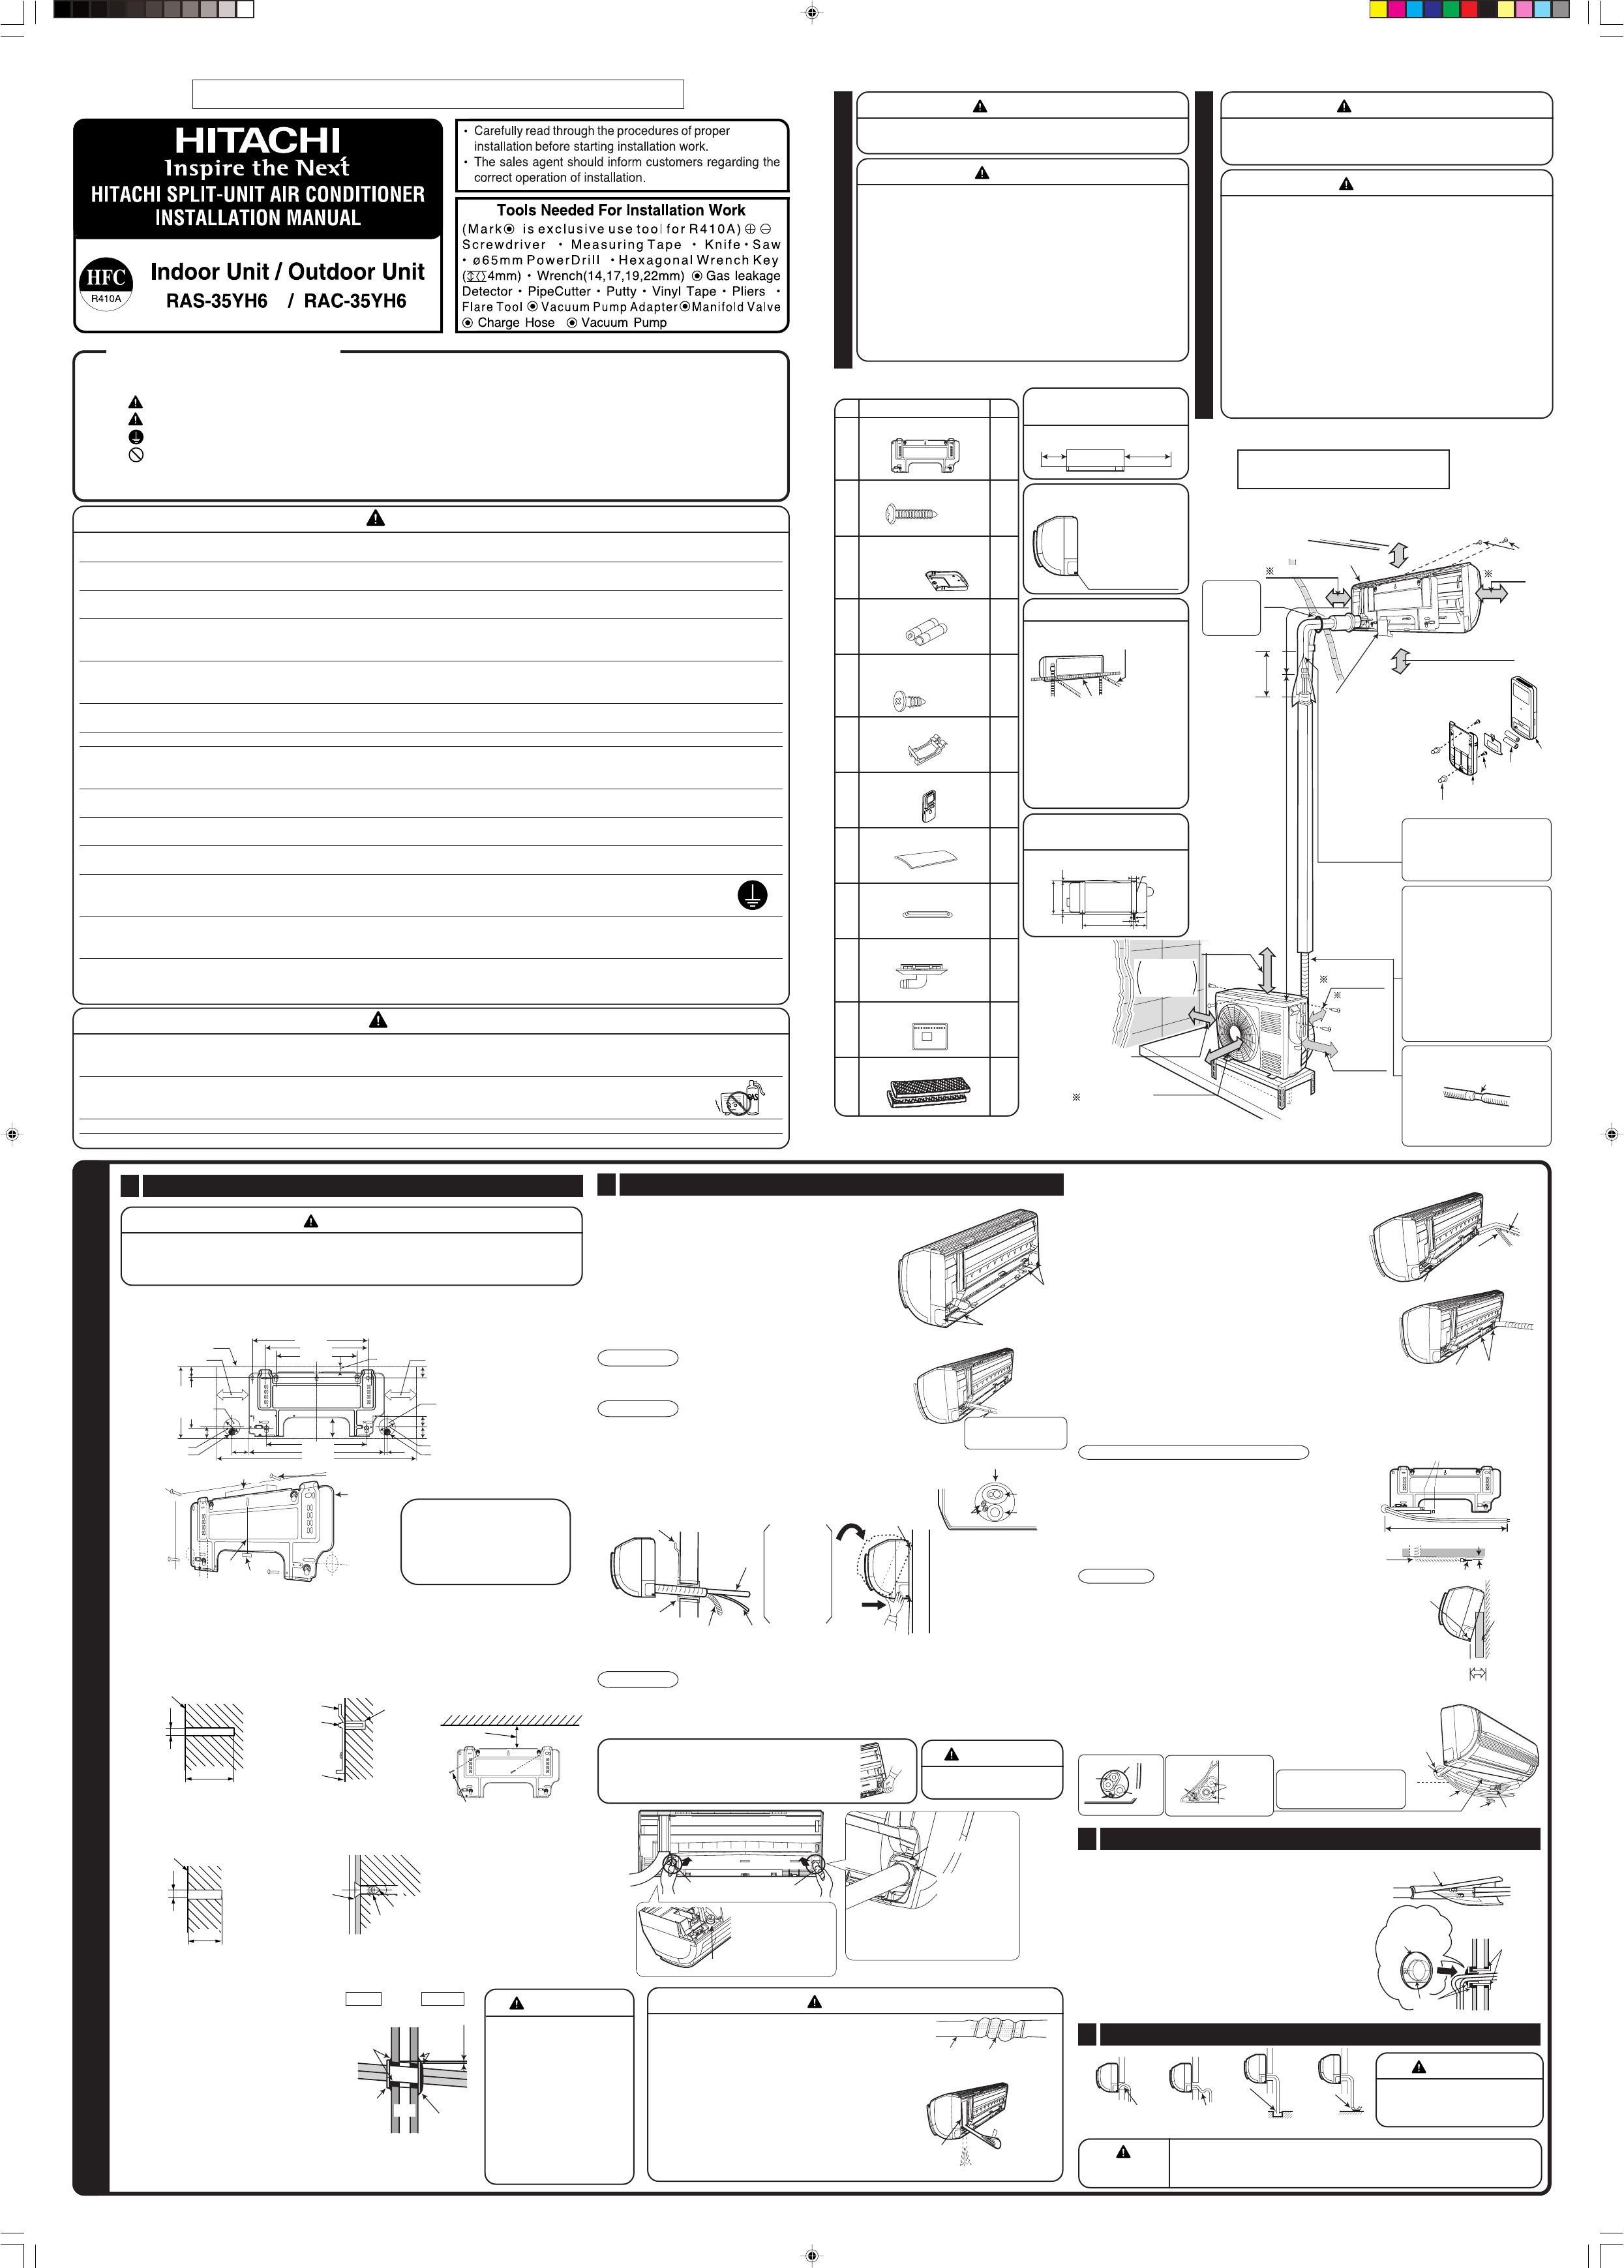 Air Conditioner Wiring Diagram Pdf - Wiring Diagram Ac Gas New Wiring Diagram Indoor Ac Fresh Air Conditioner Wiring Diagram Pdf 6p